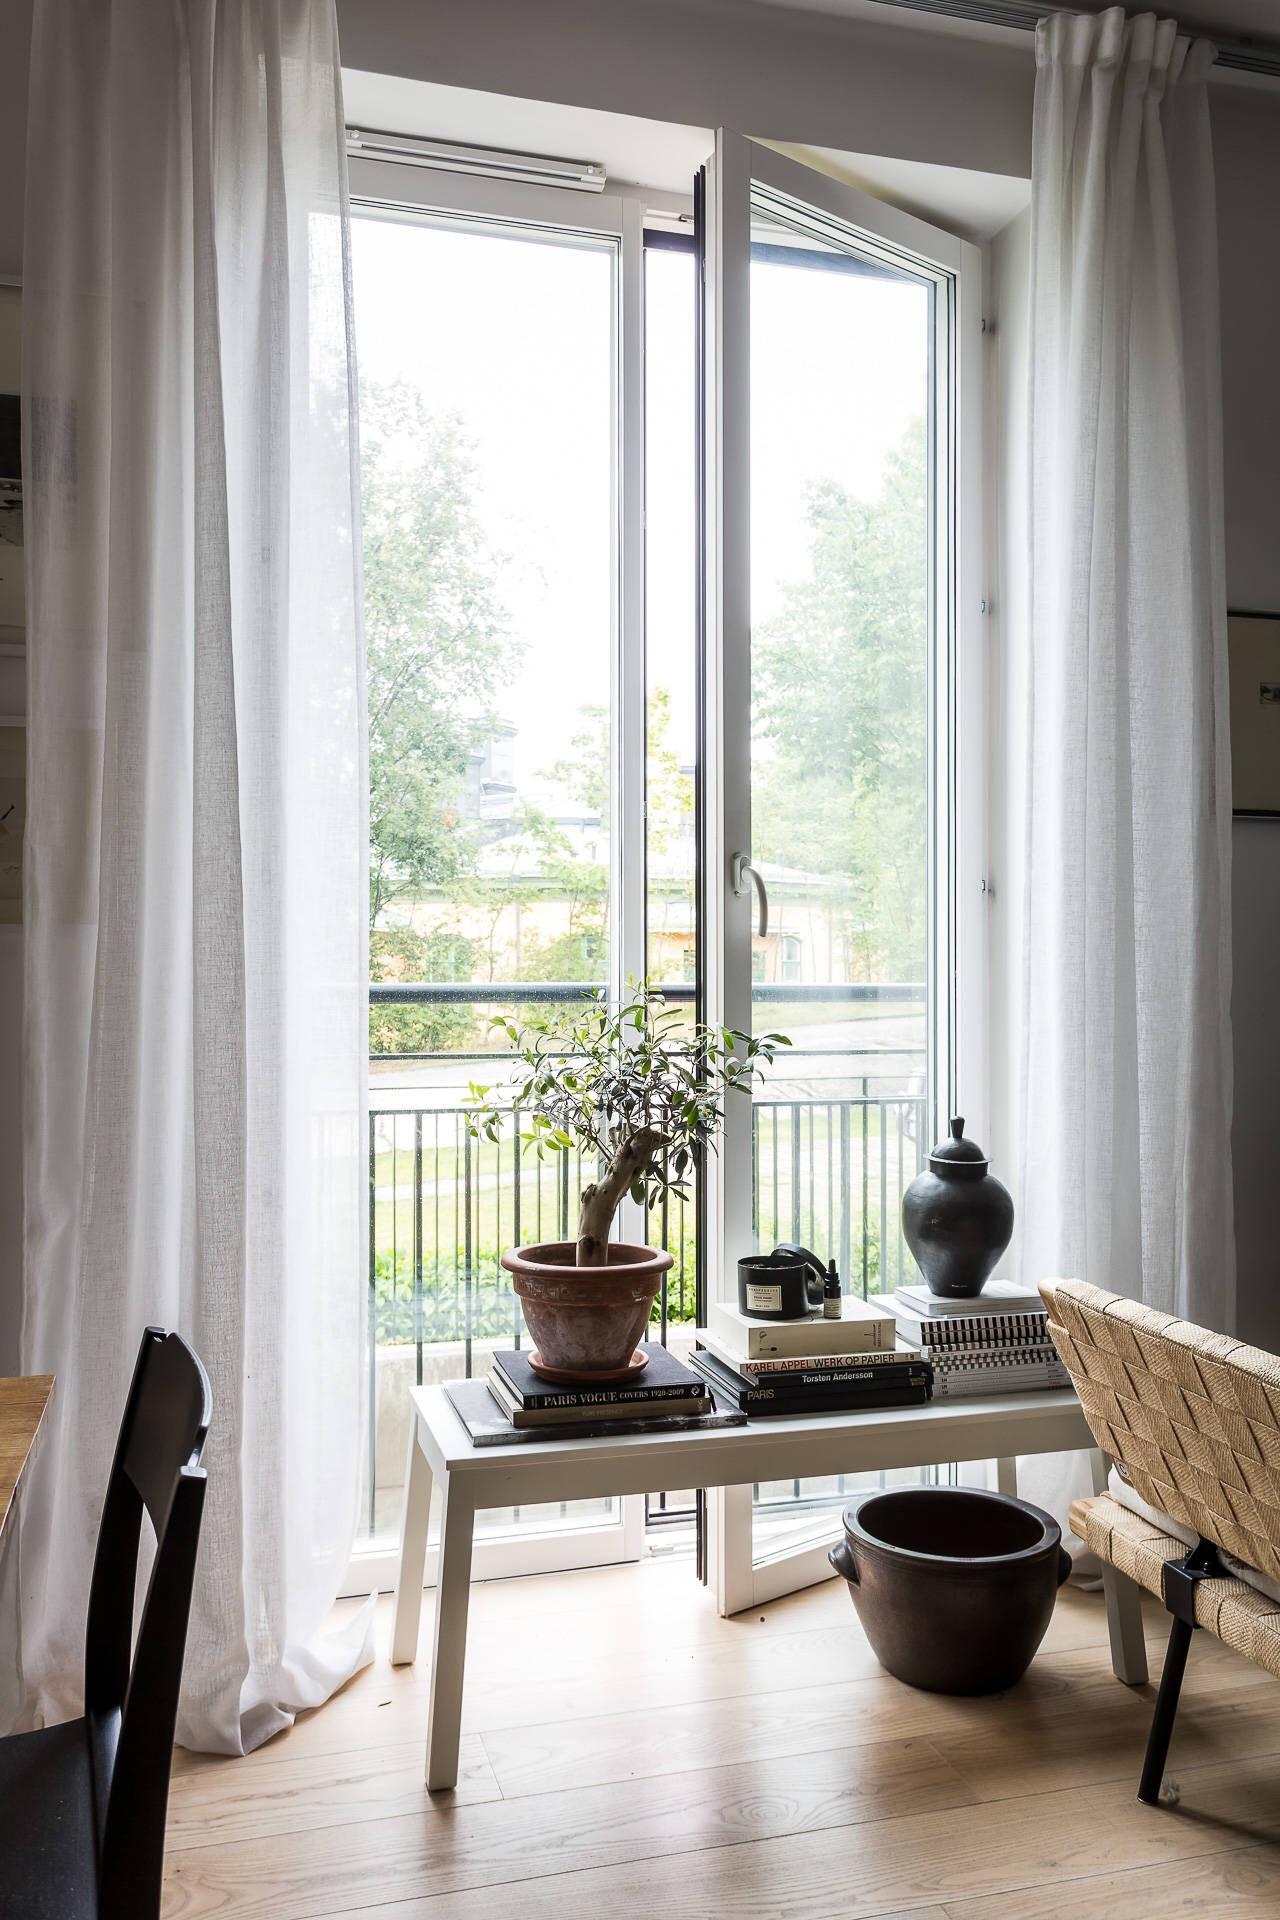 французские окна скамейка декор